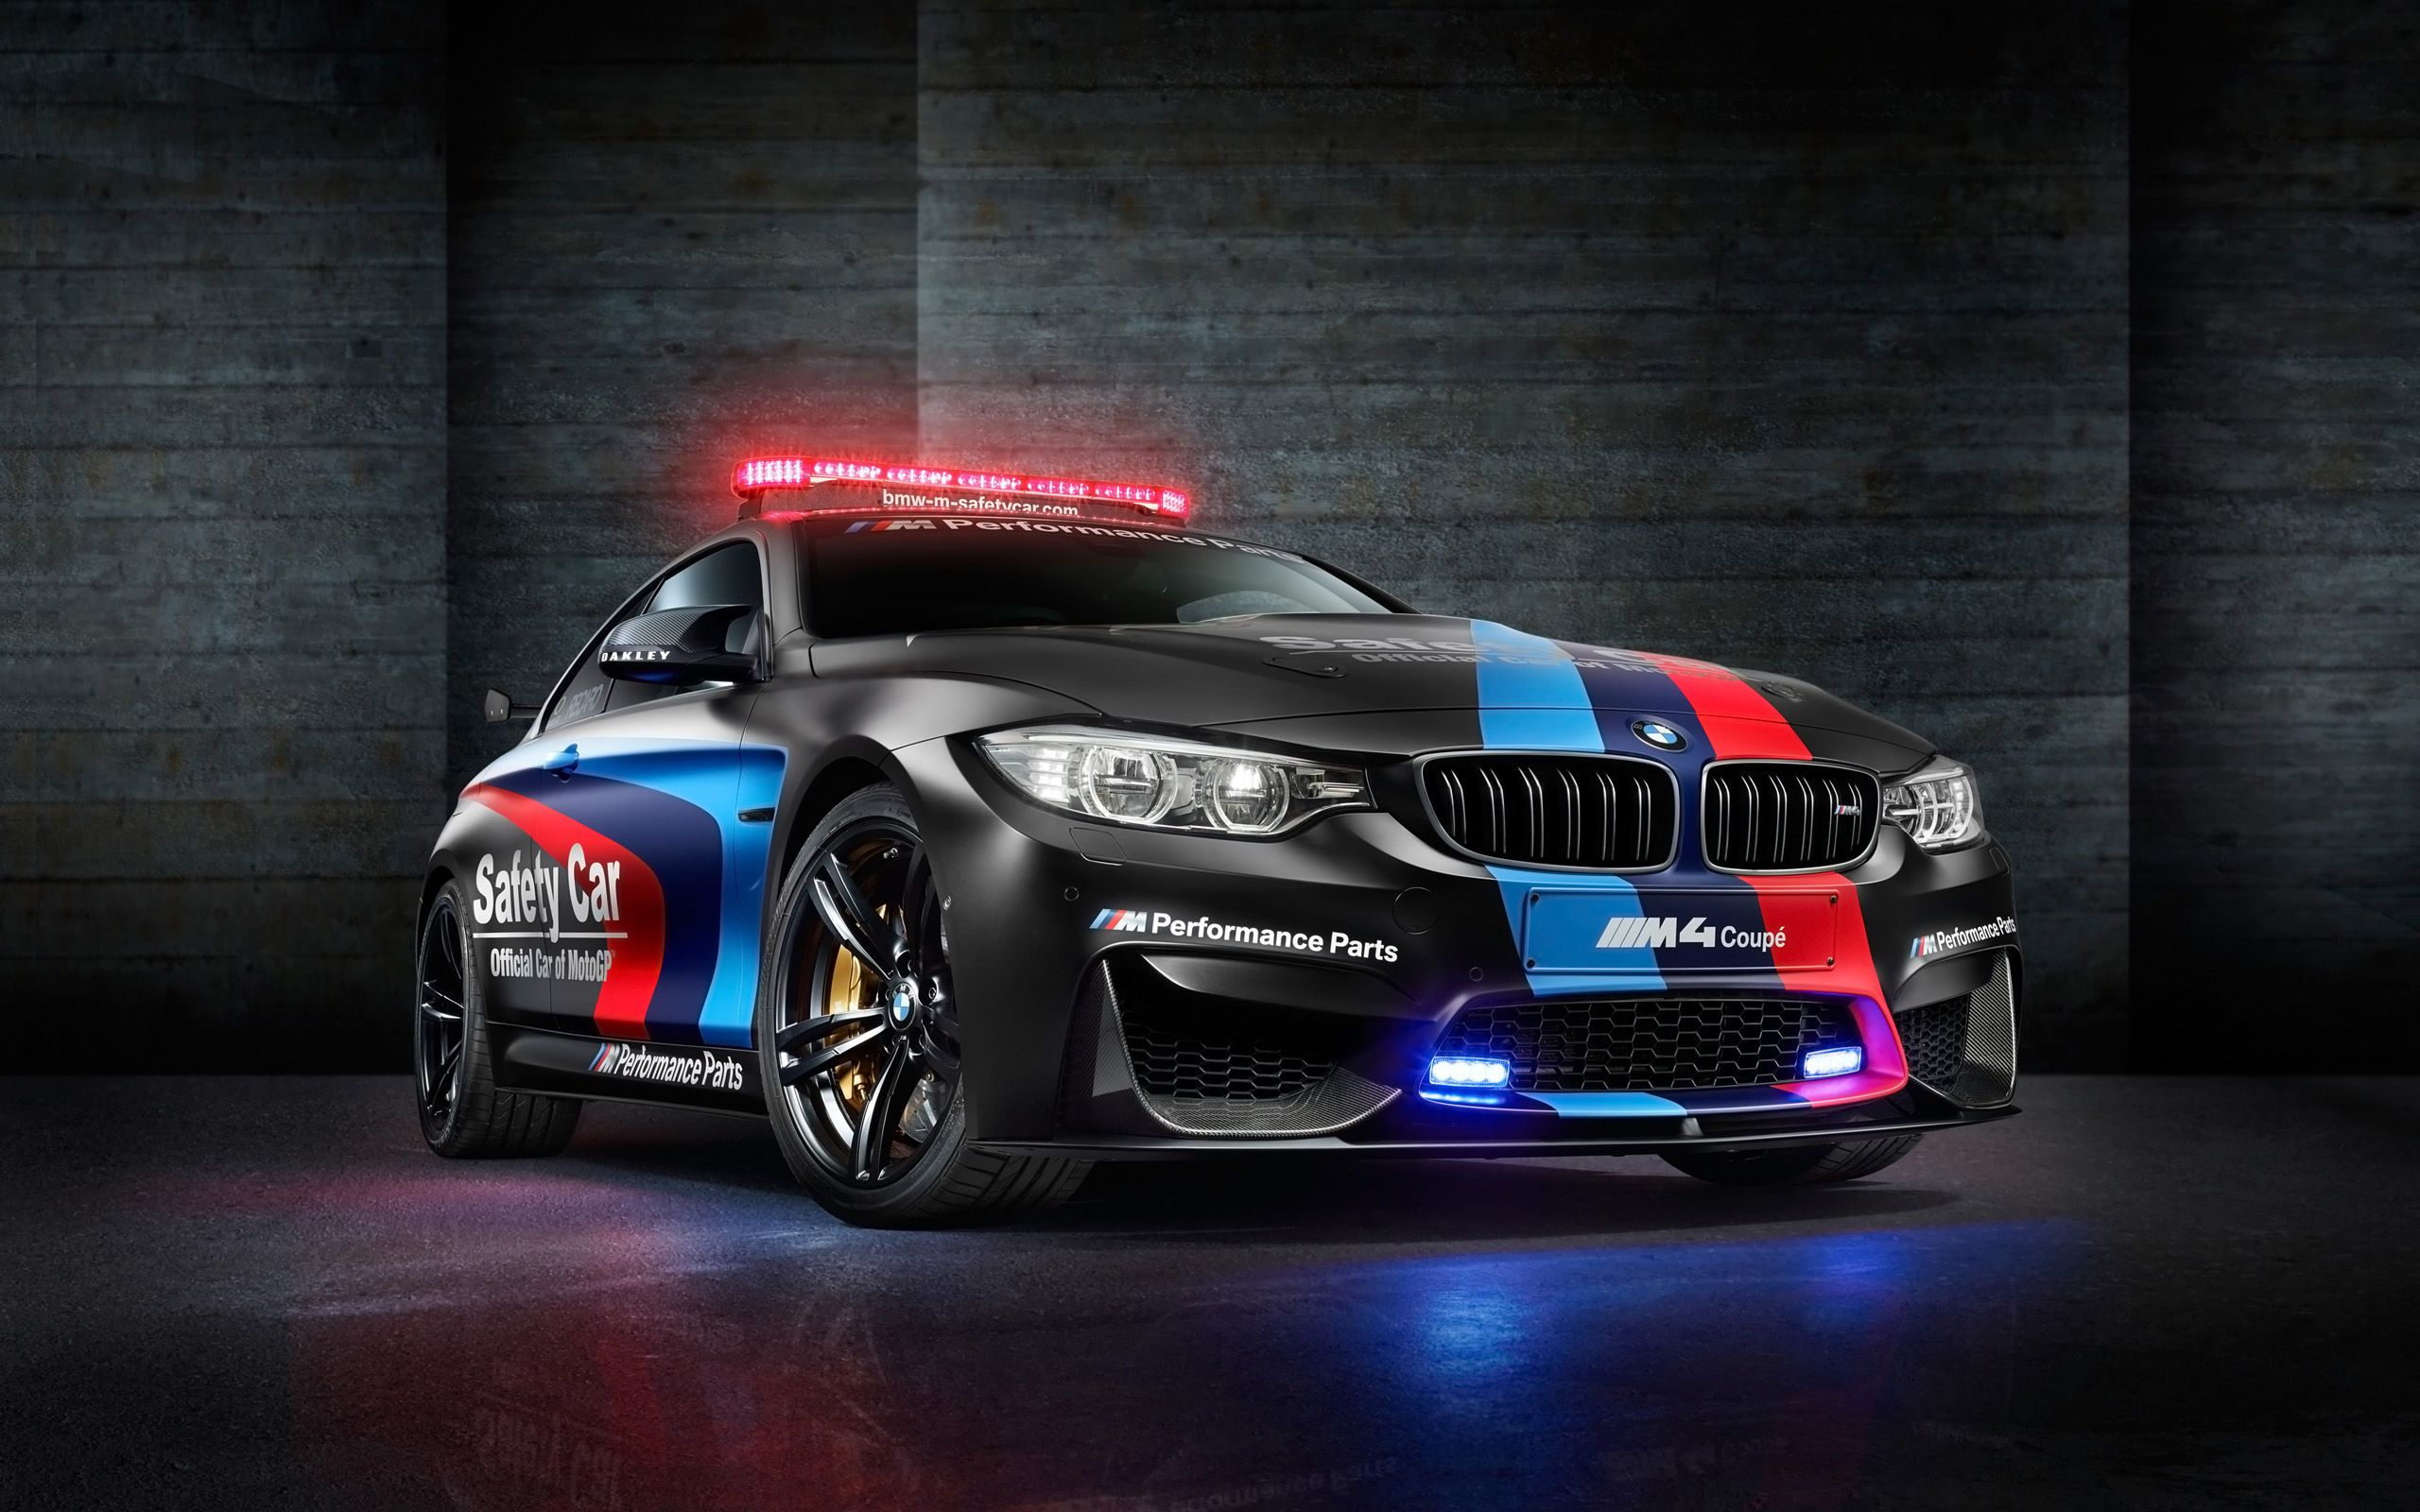 2015 Bmw M4 Motogp Safety Car Car Hd Wallpaper Bmw M4 Modele De Voiture Bmw Serie 6